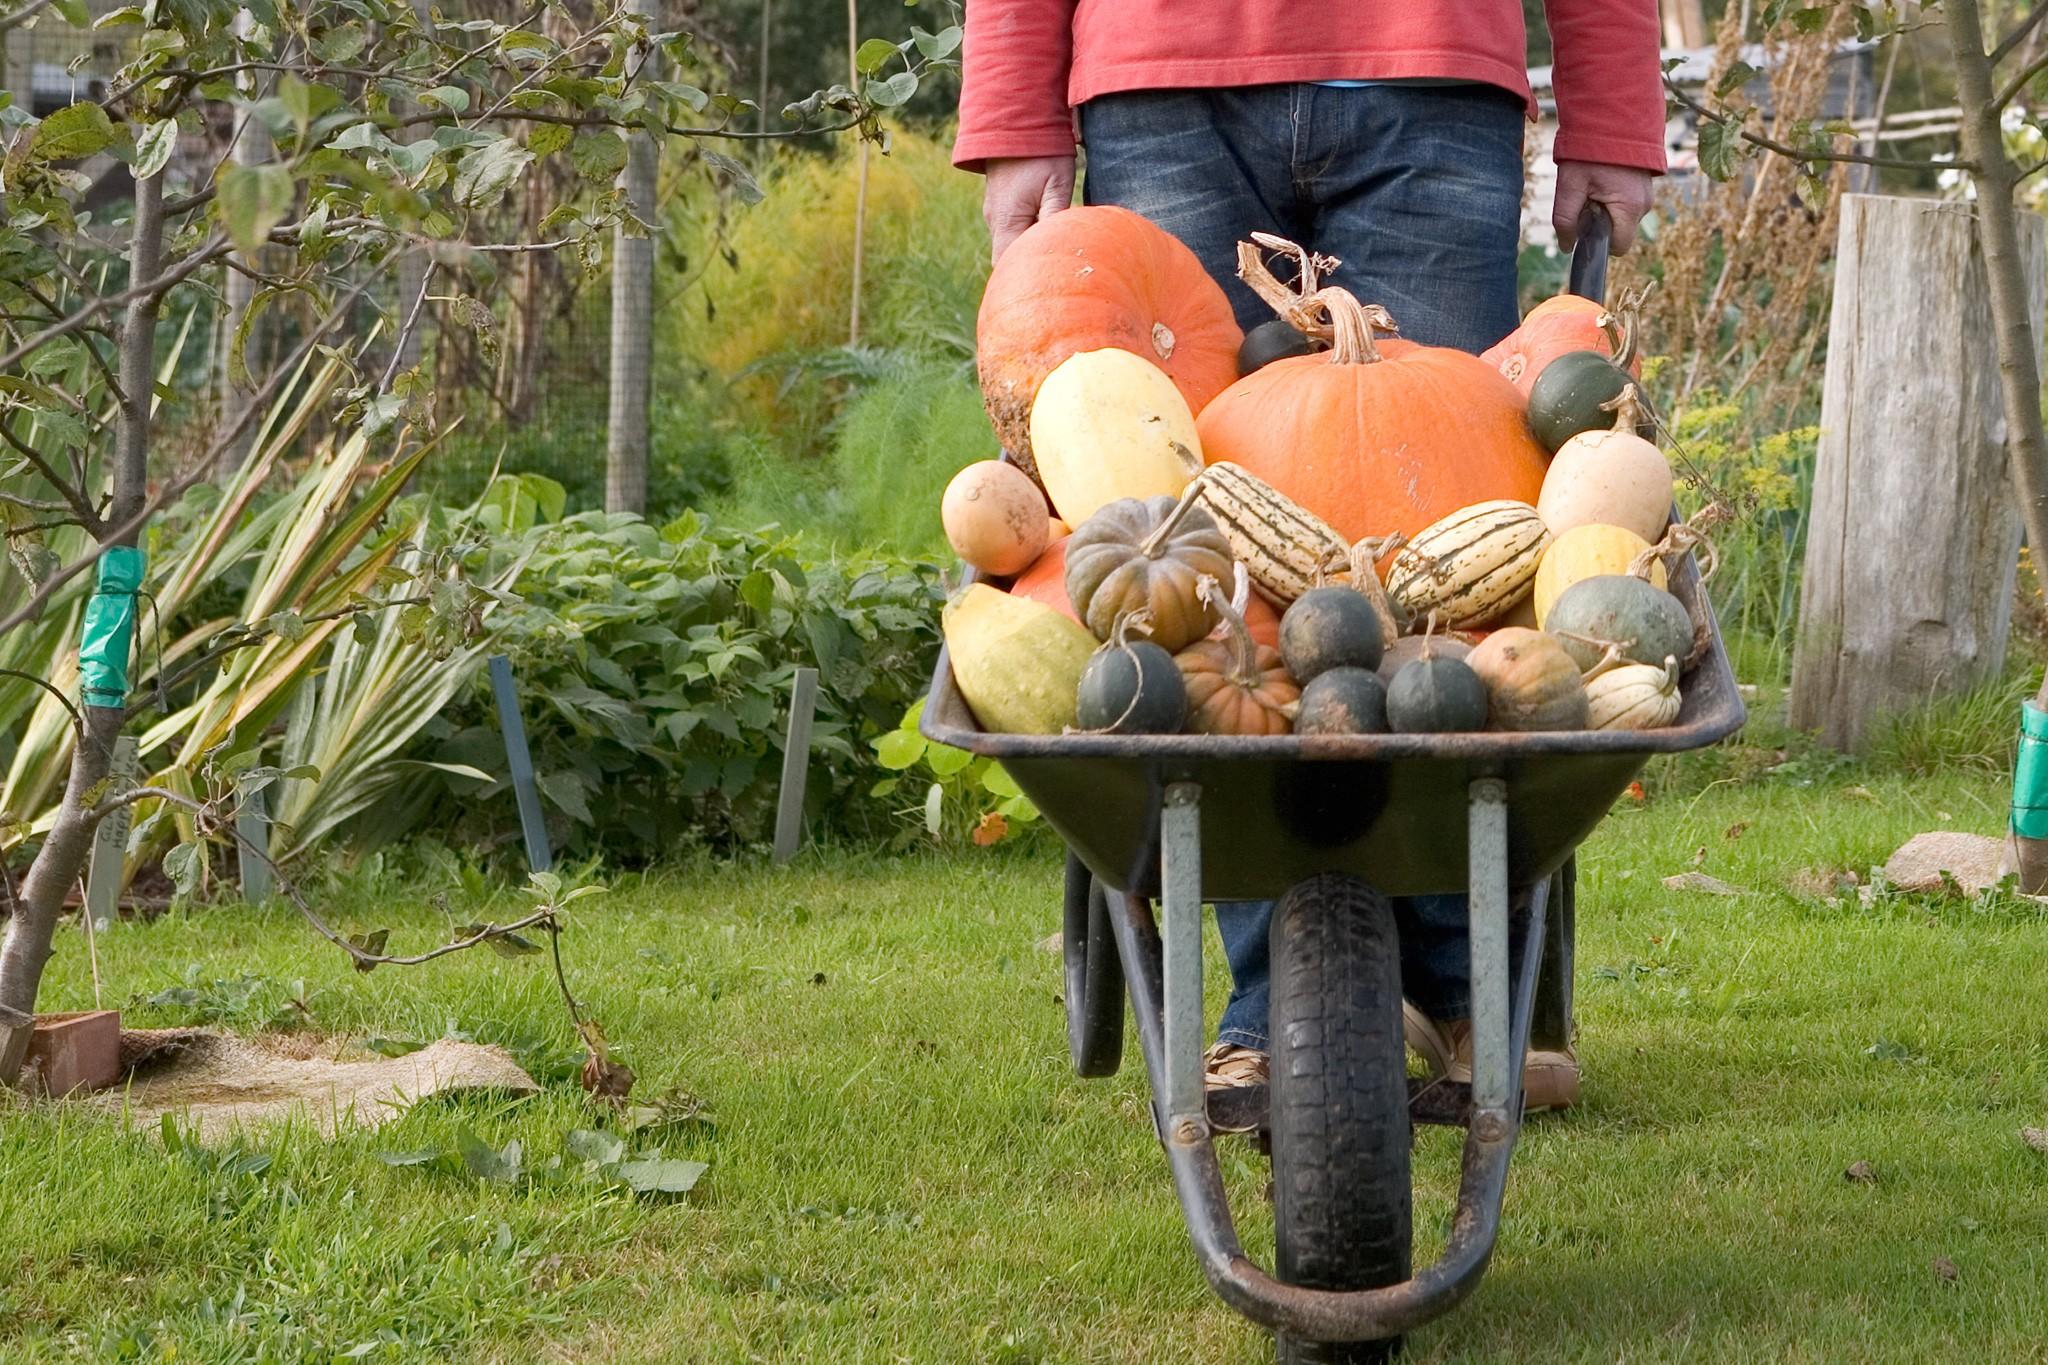 Pumpkins in wheelbarrow